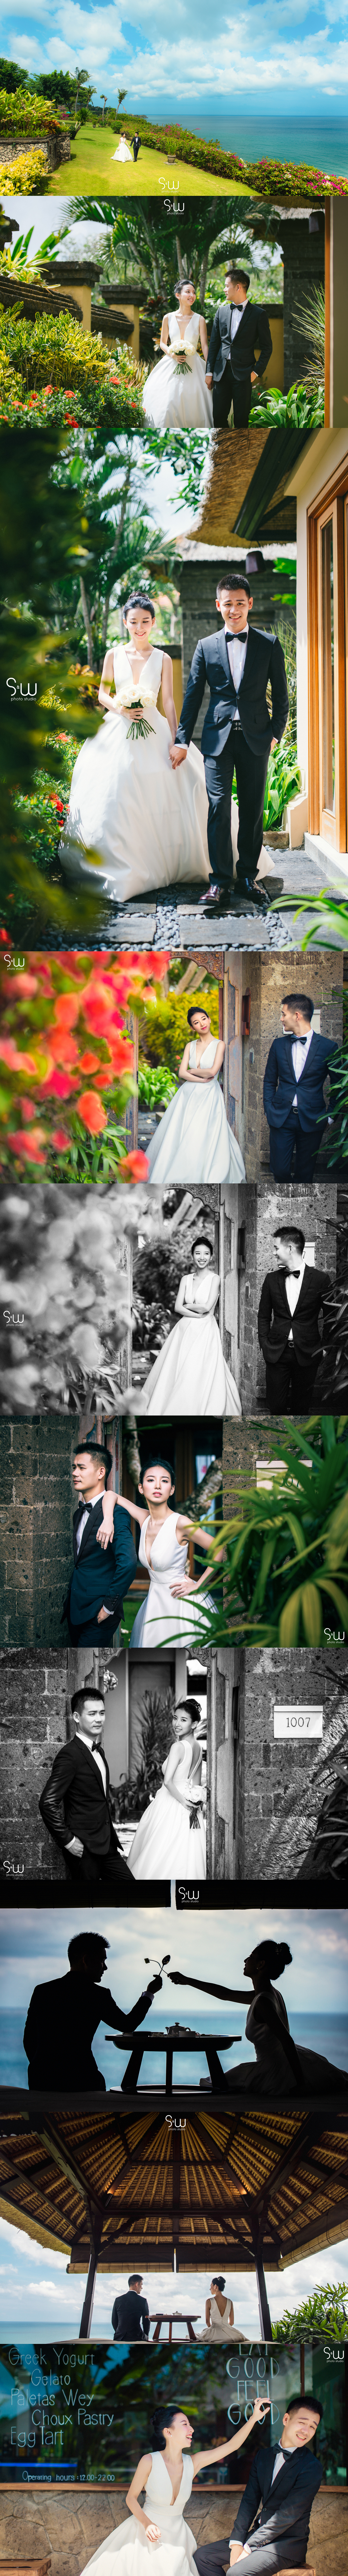 PRE-WEDDING | BALI (峇里島婚紗) | sw photo studio 婚禮, 婚攝, 婚紗, 海外婚禮, 海外婚紗, 海島婚禮,峇里島婚禮, 峇里島婚紗, 台灣婚禮, 婚攝推薦